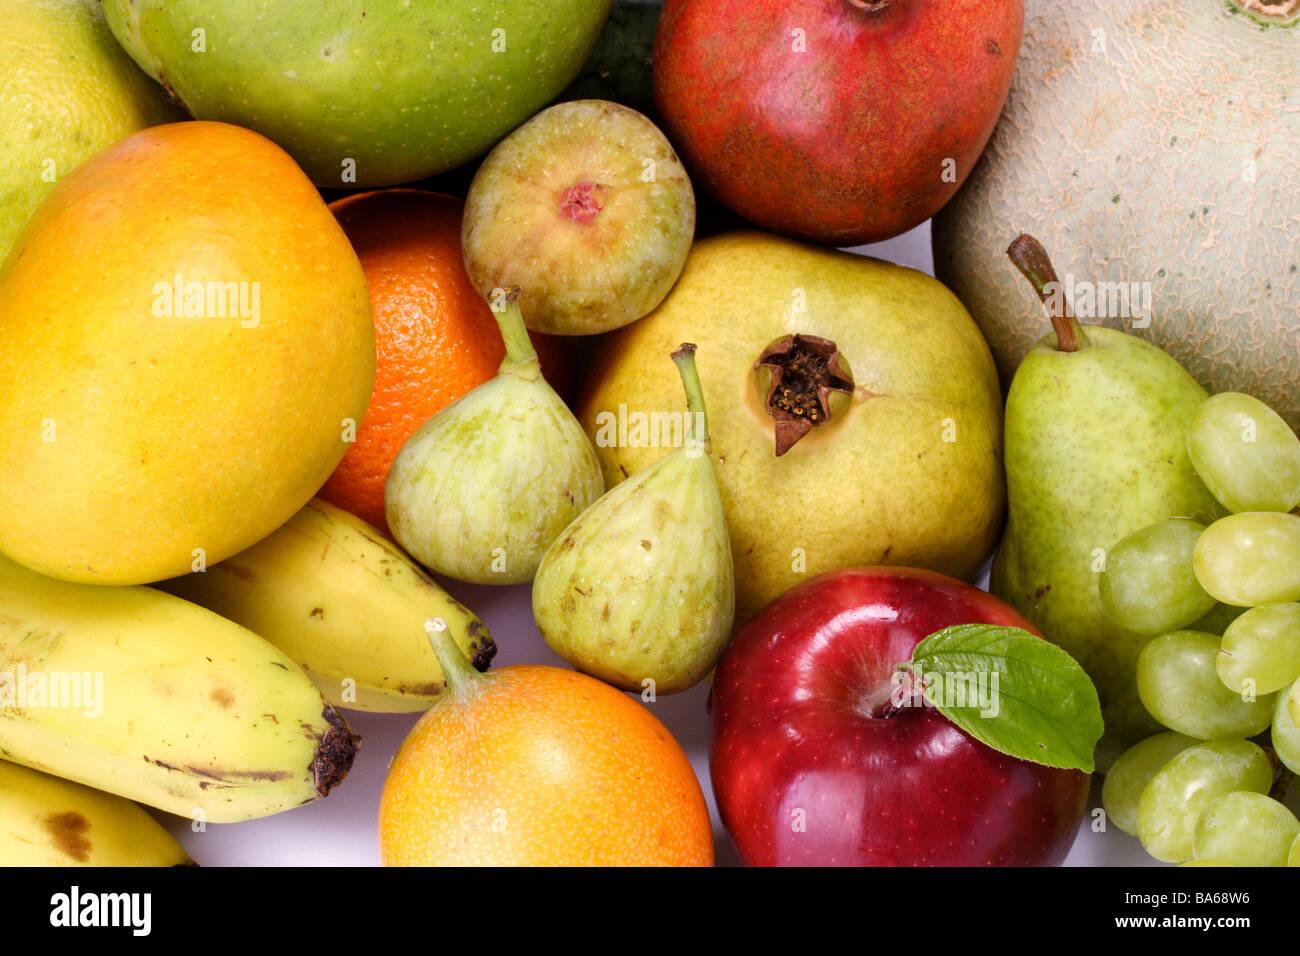 Frutas frescas para fondos Imagen De Stock